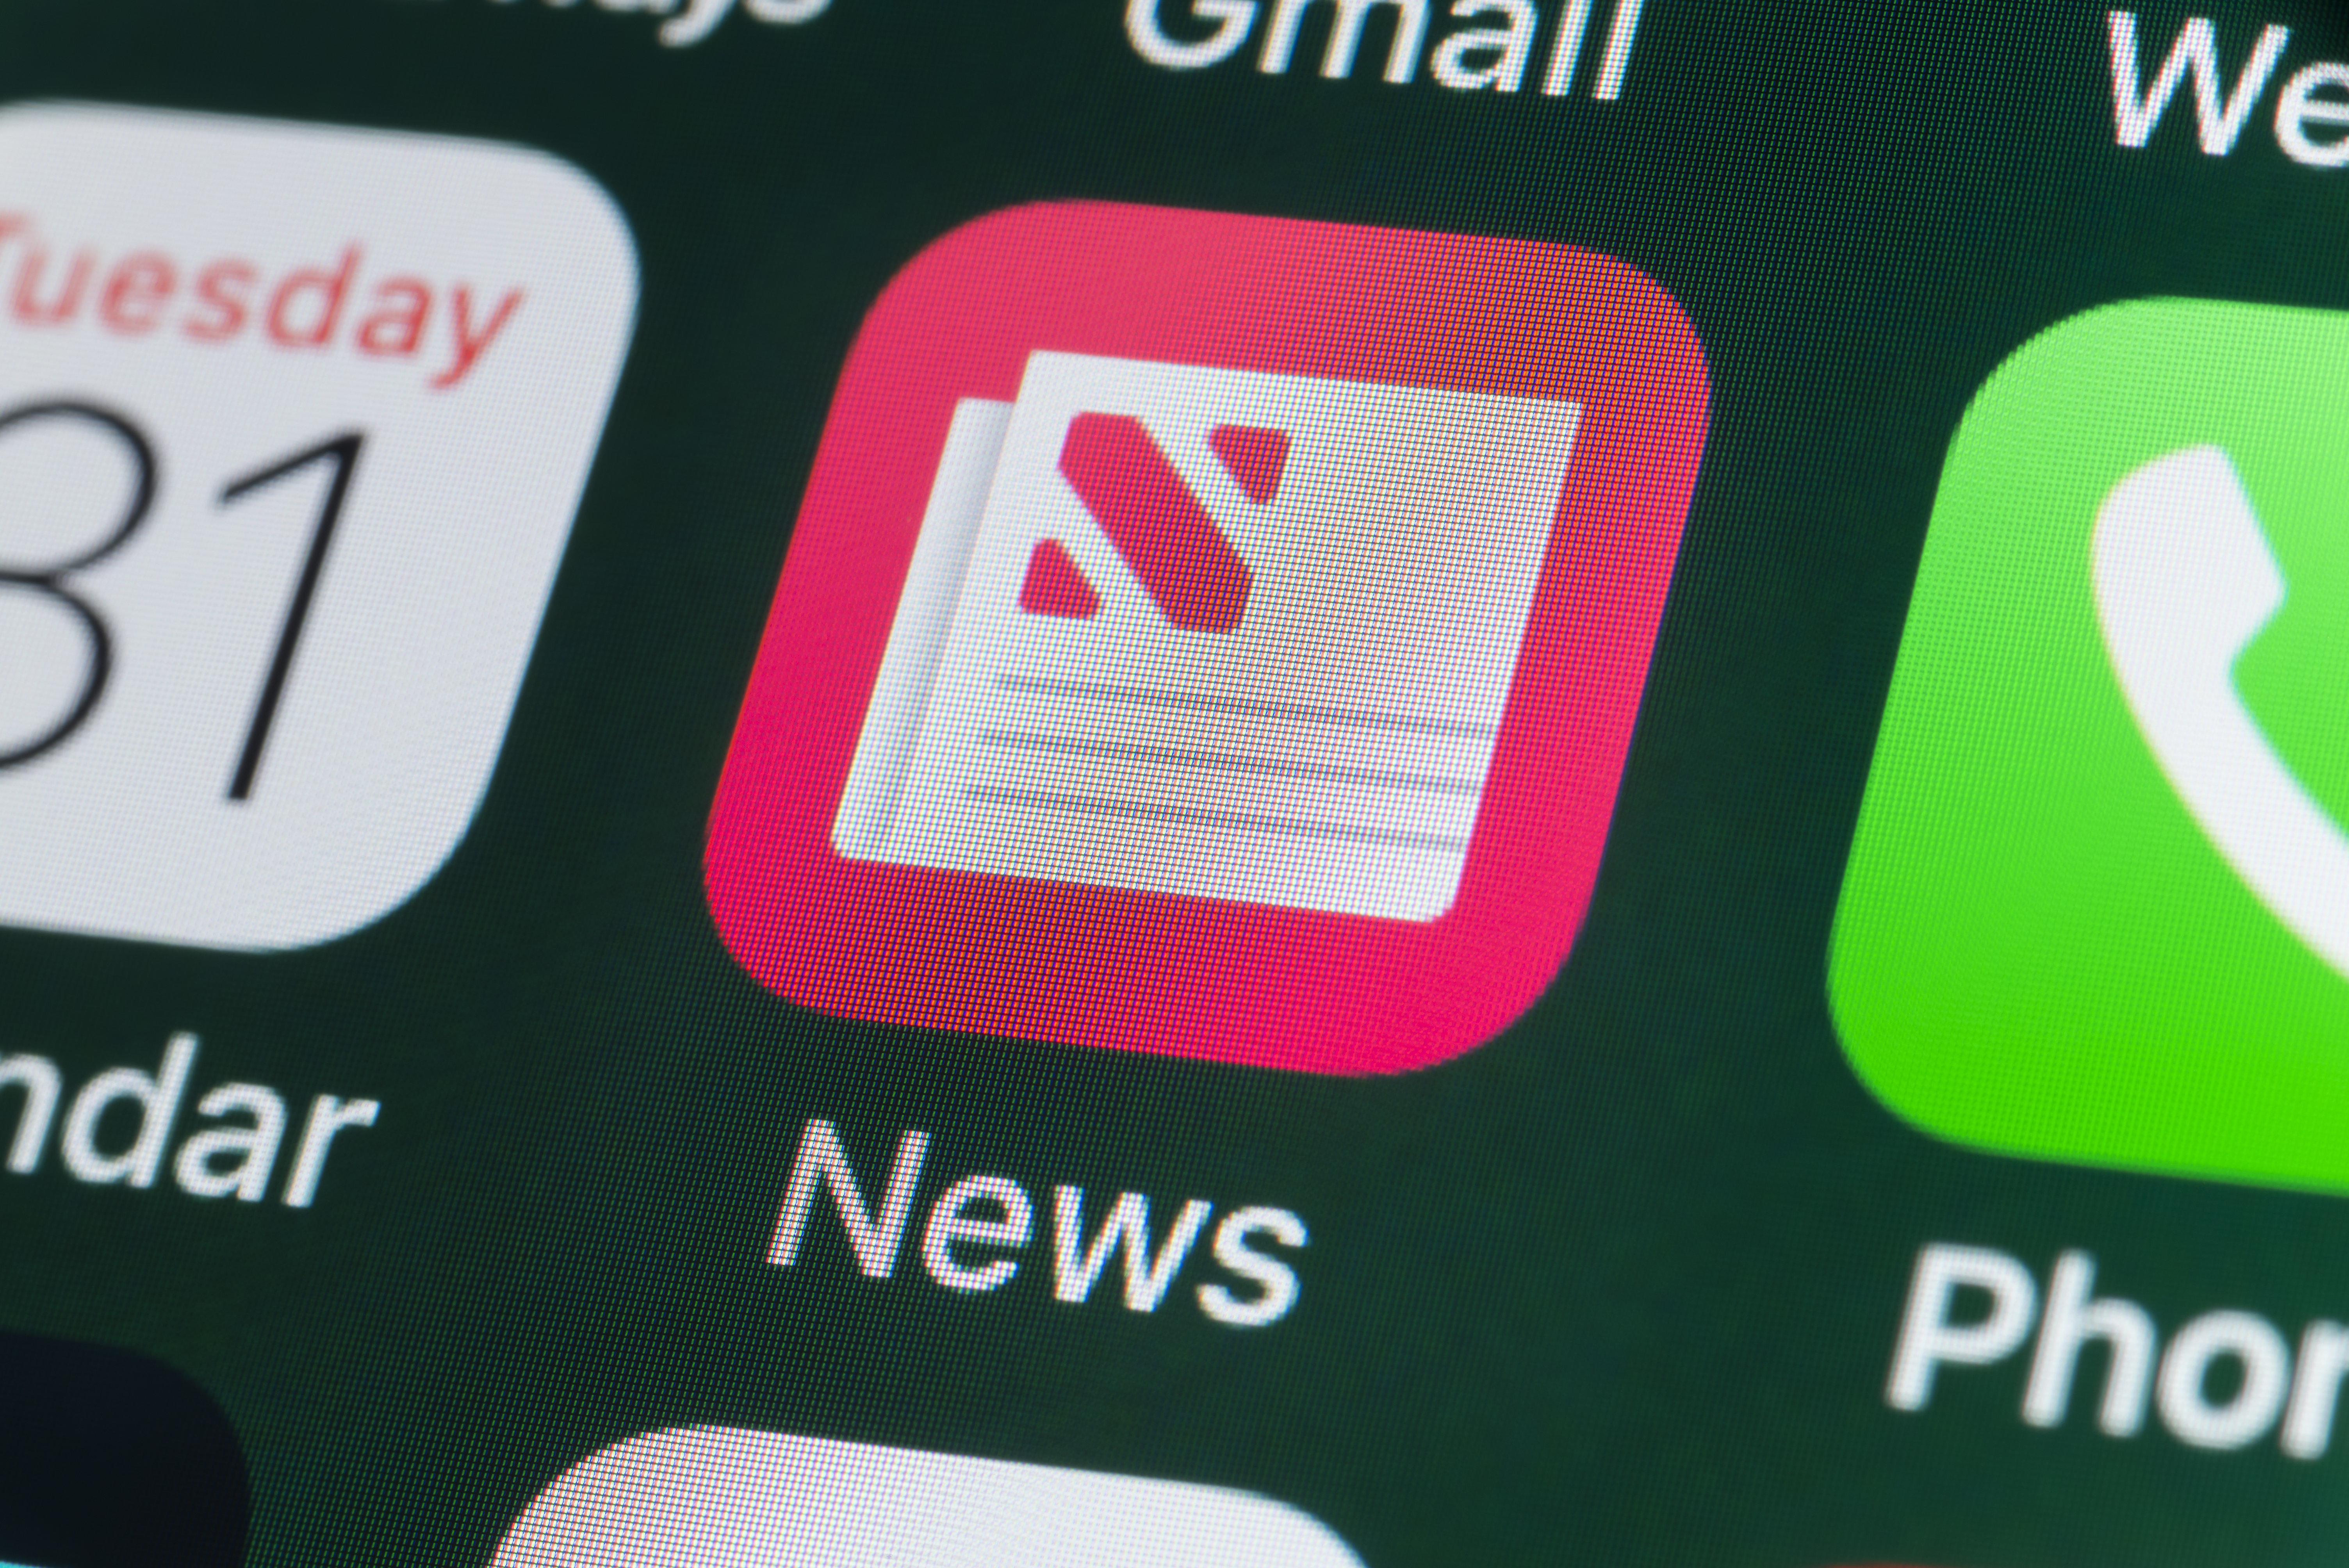 Apple News: Οταν οι άνθρωποι νίκησαν τους αλγόριθμους